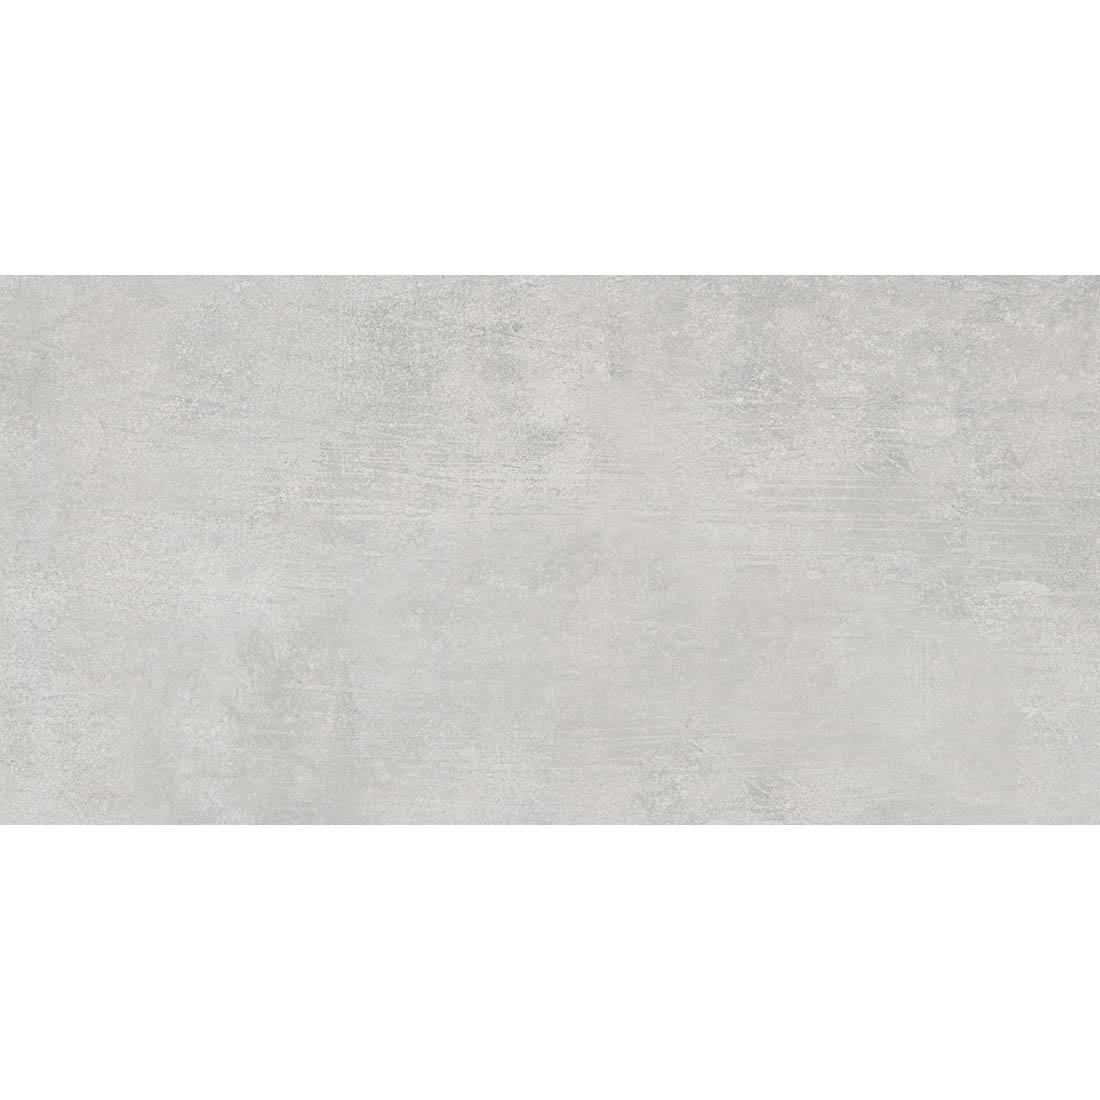 Pamukkale 30x60 Grey Matt 1